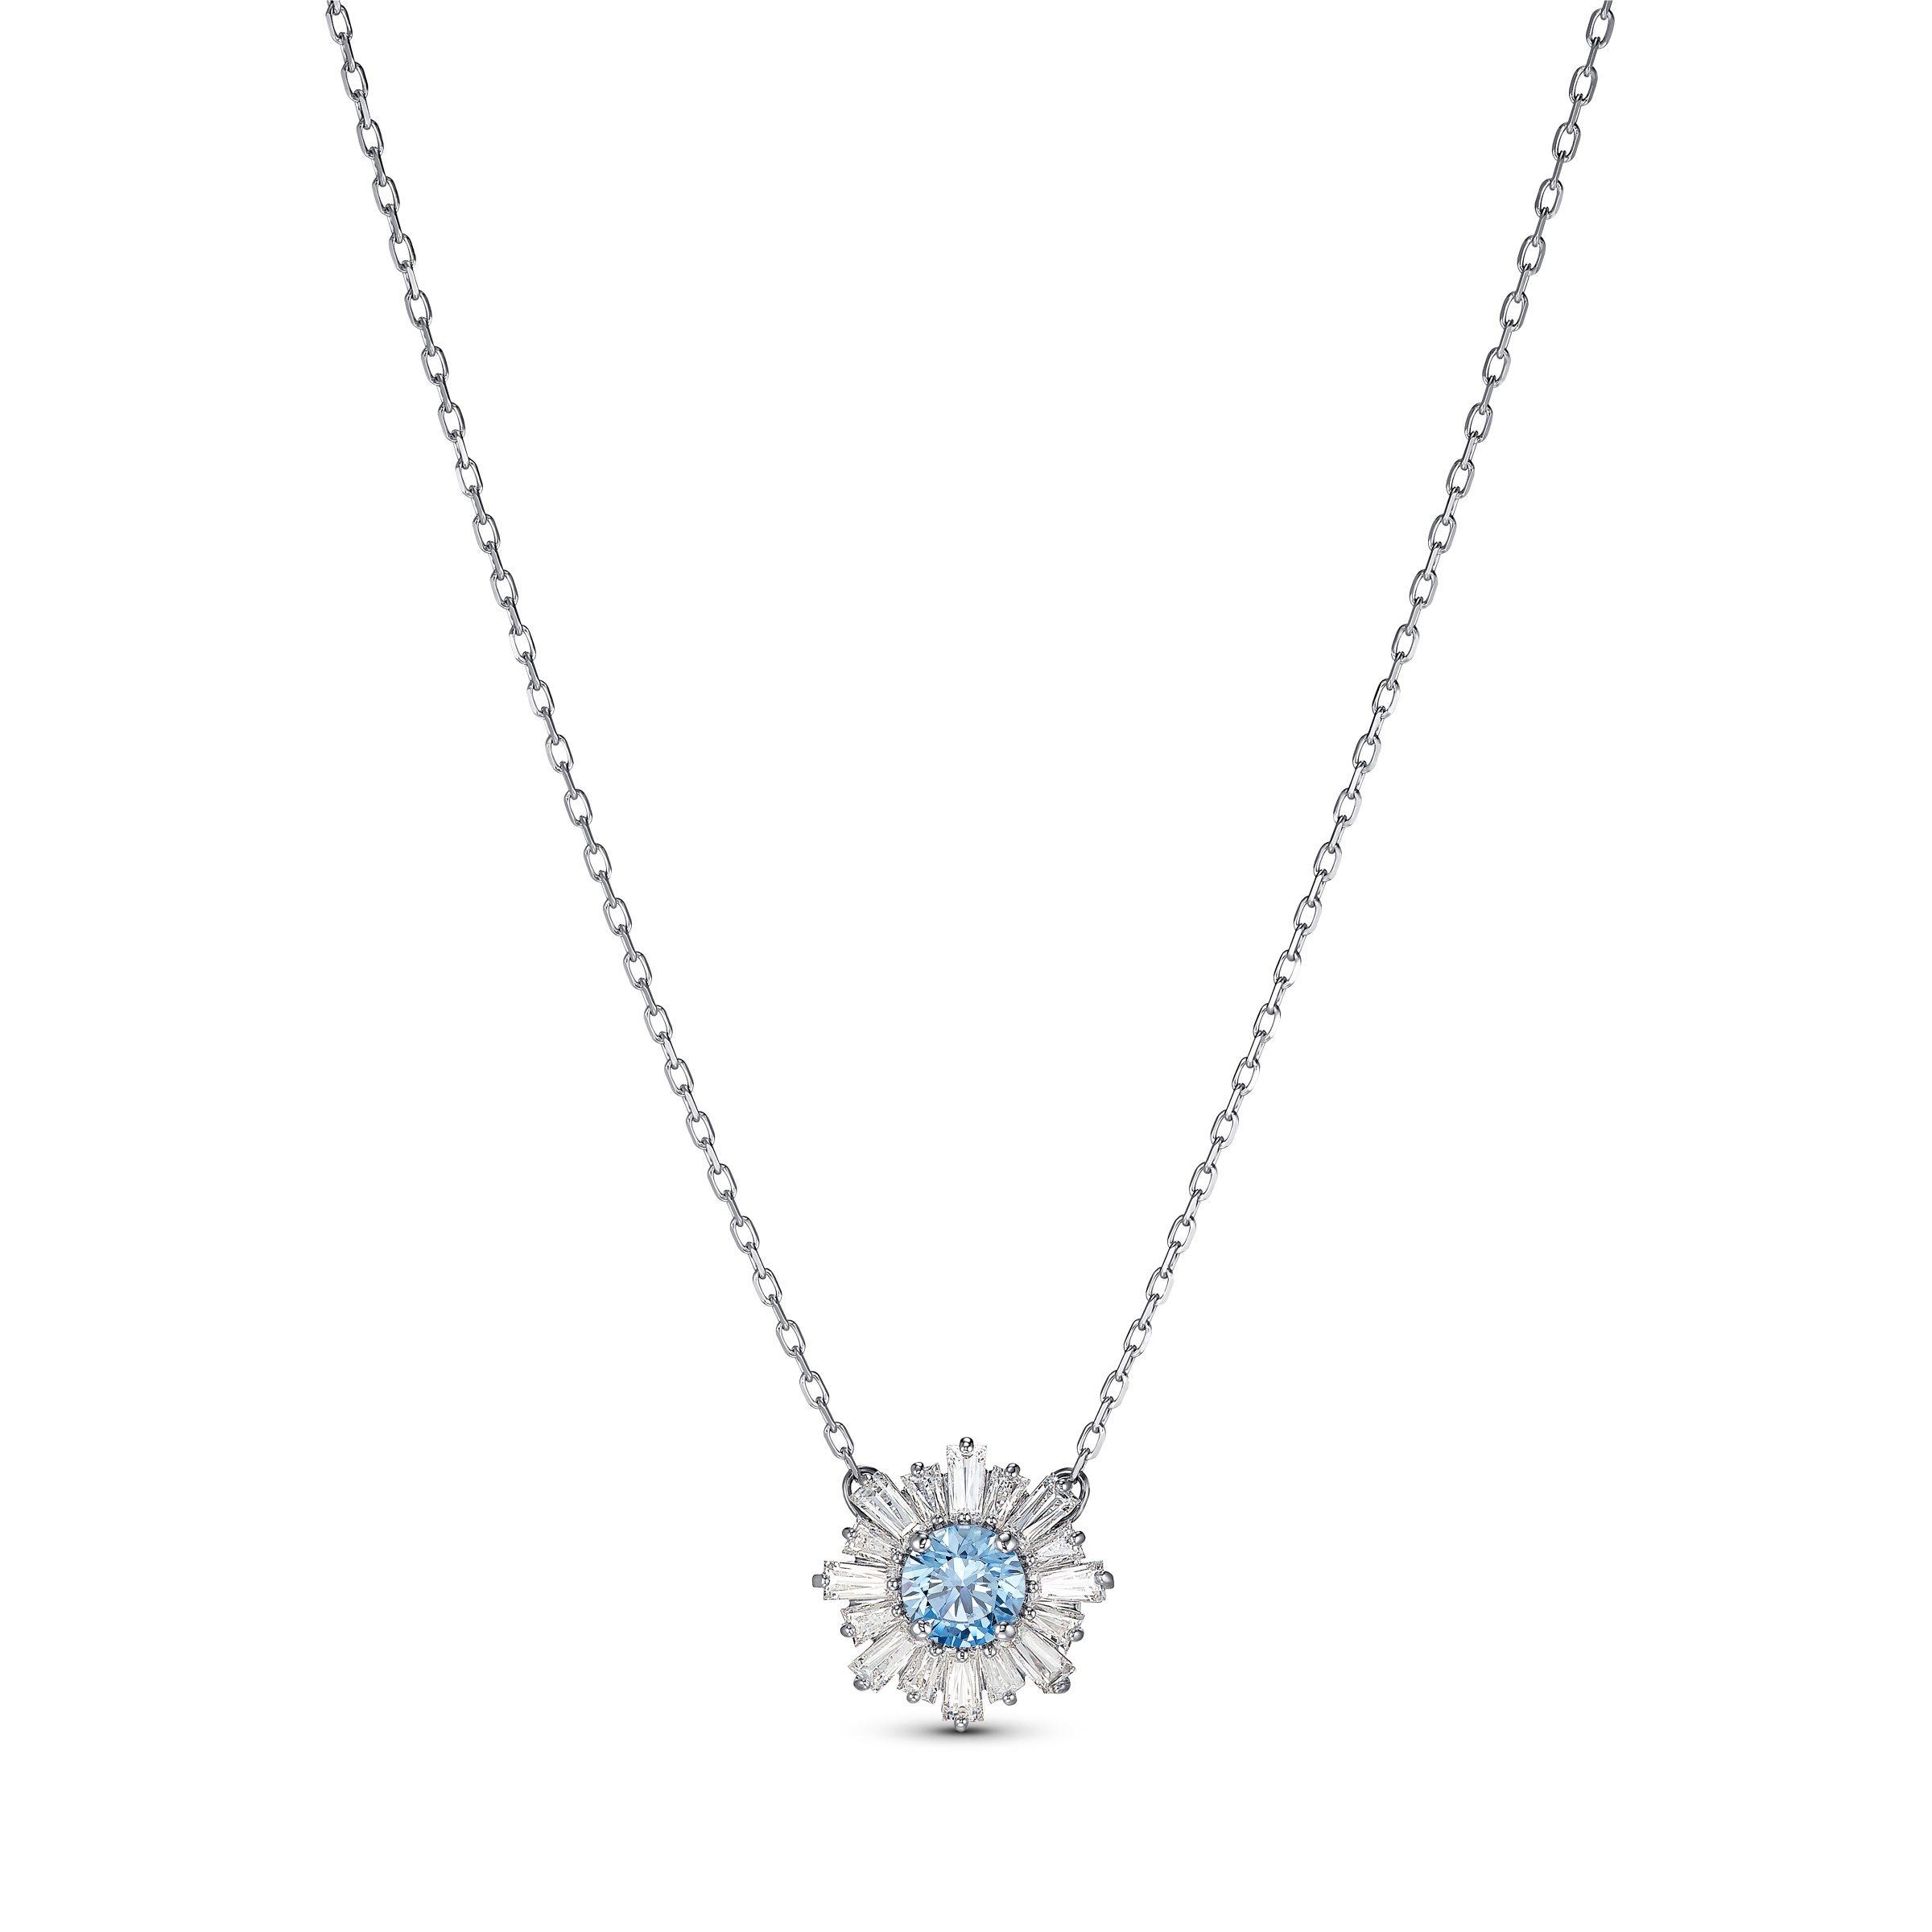 Pendentif Sunshine, bleu, métal rhodié, Swarovski